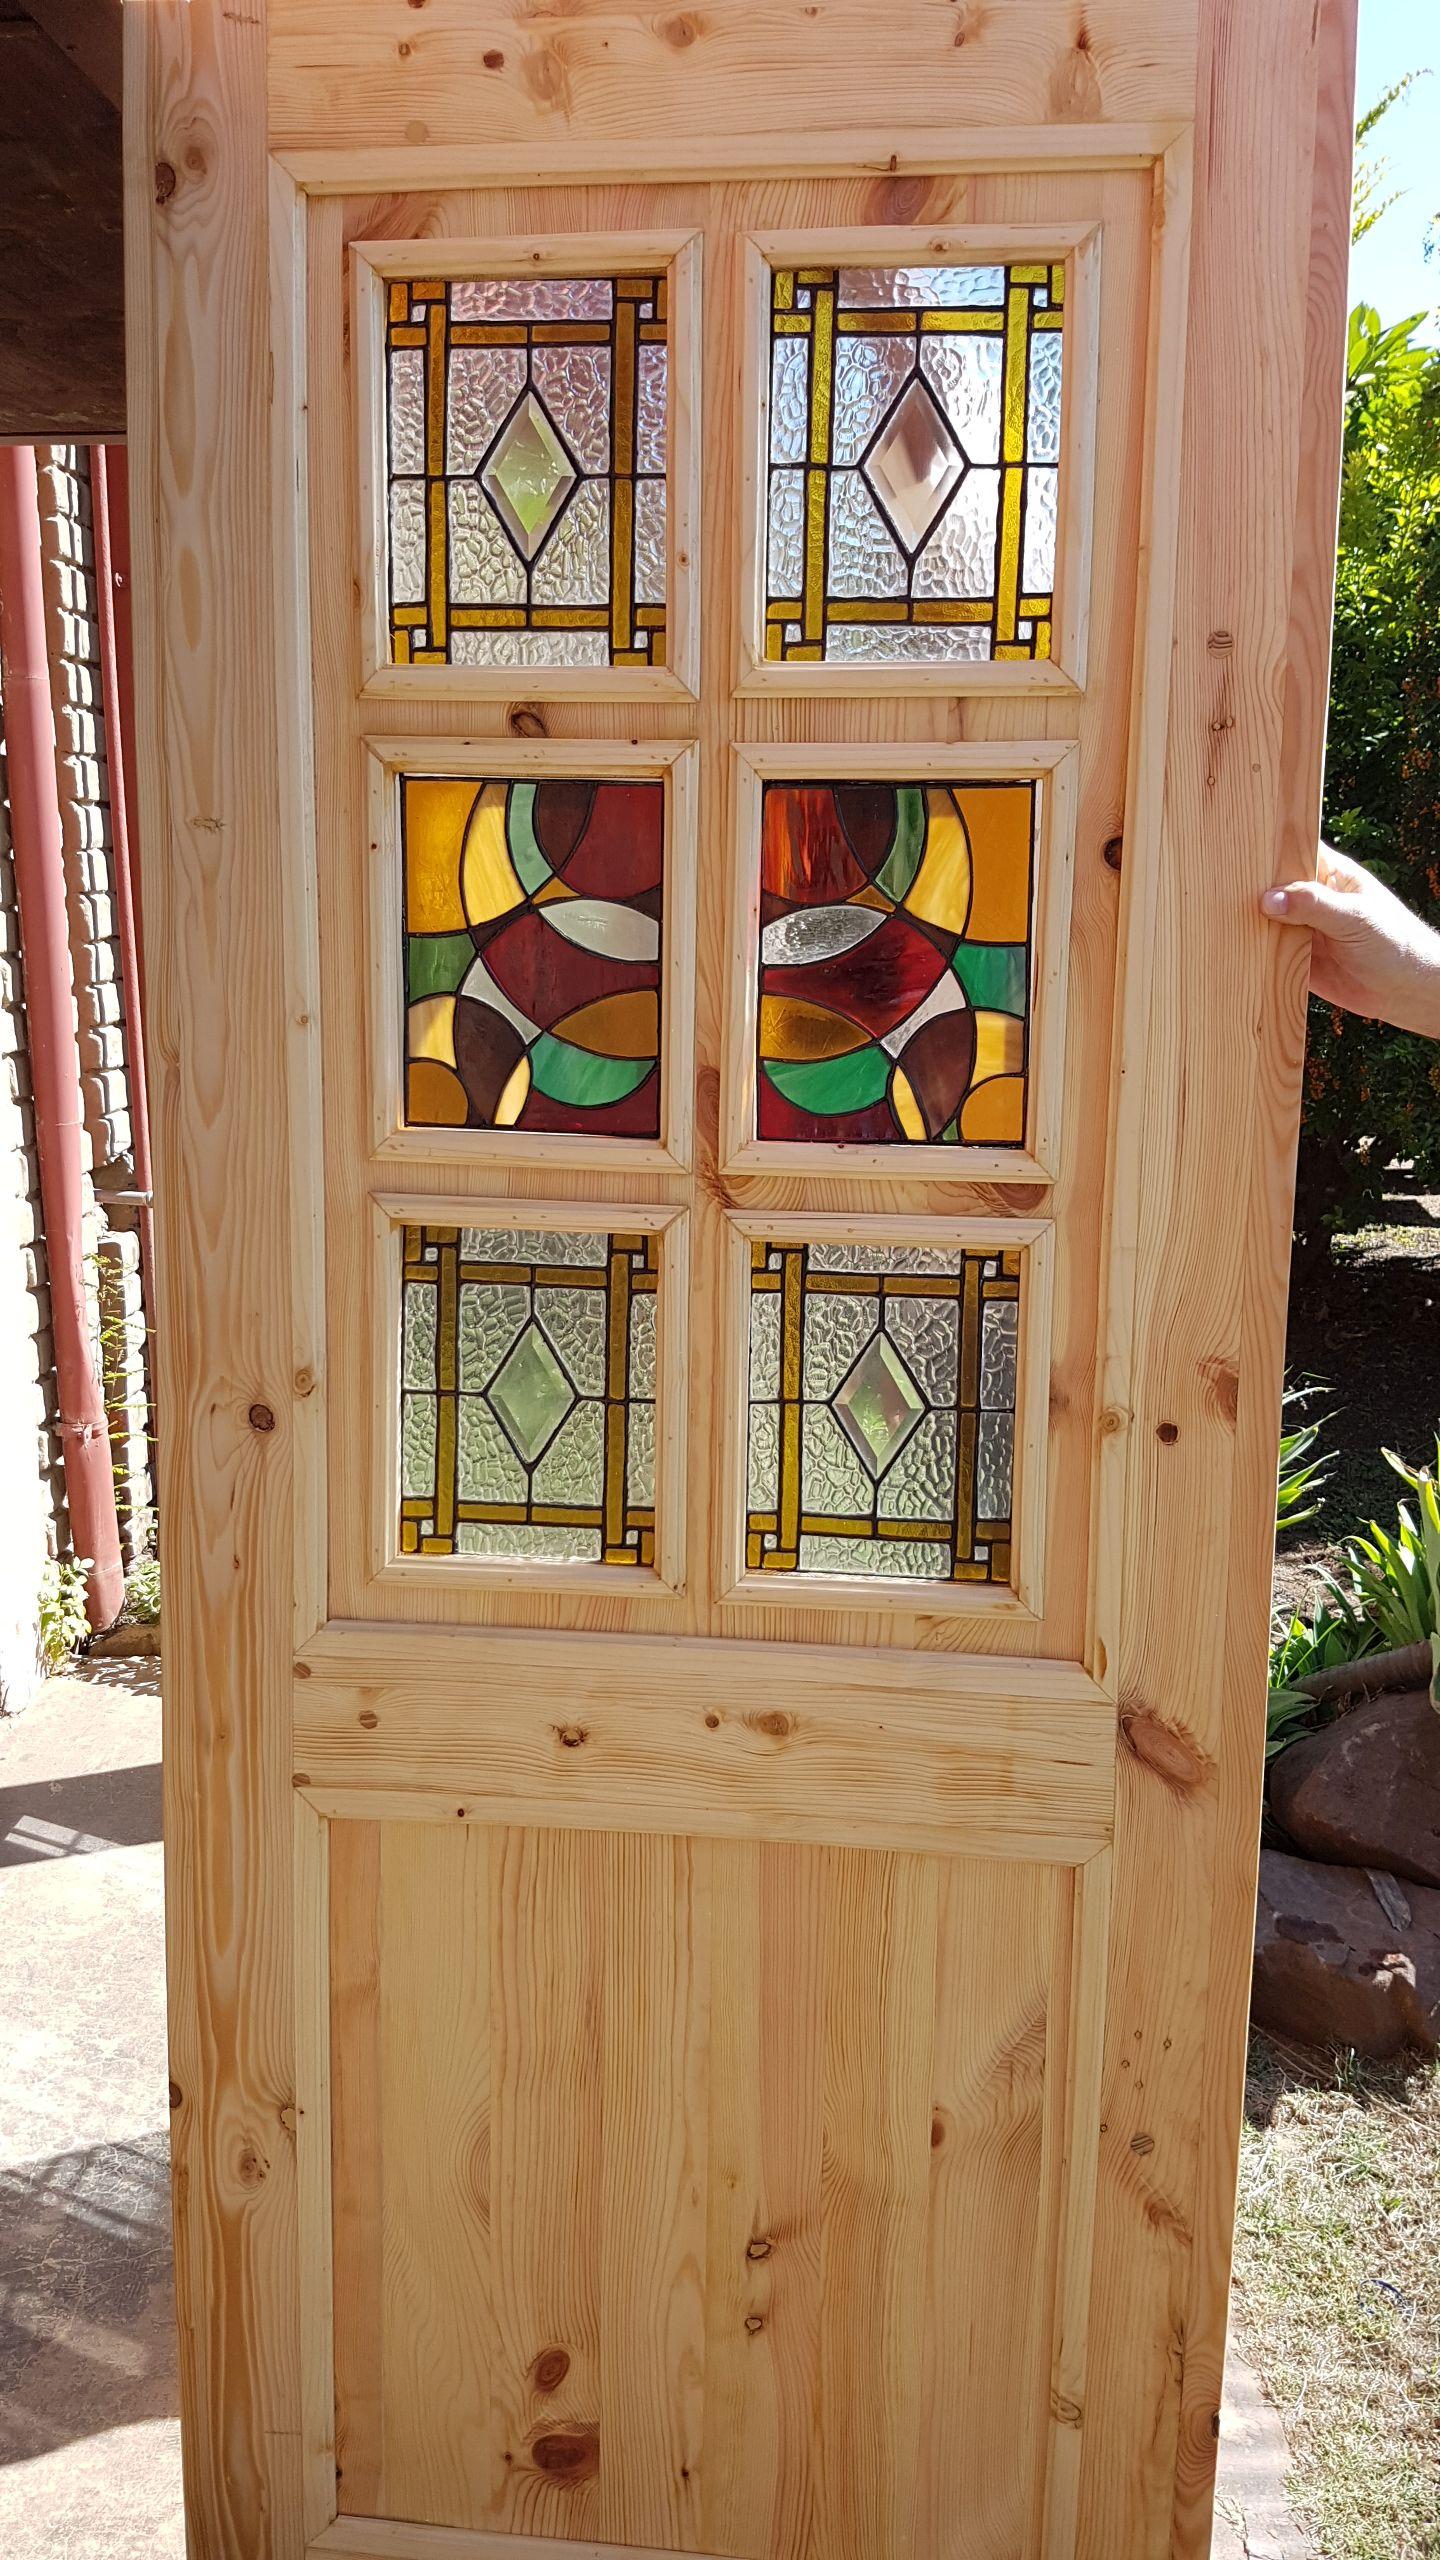 Rustic Furniture And Doors